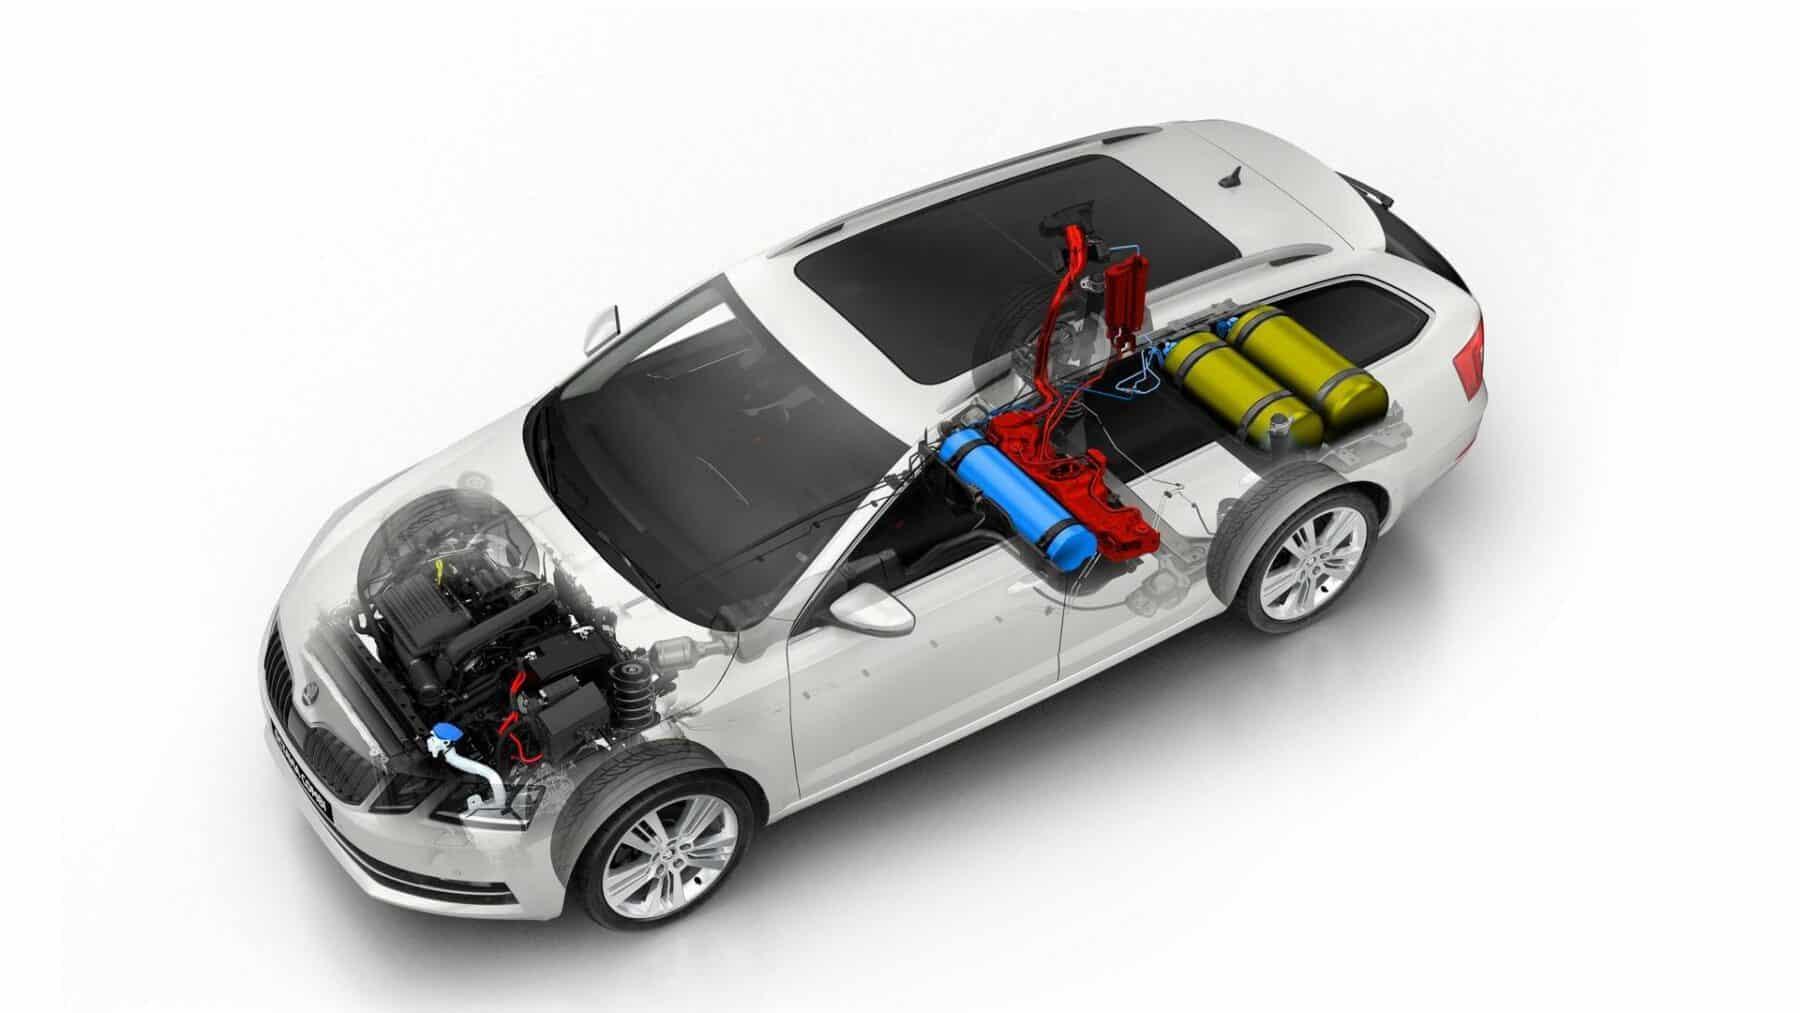 Convertir tu coche a autogas